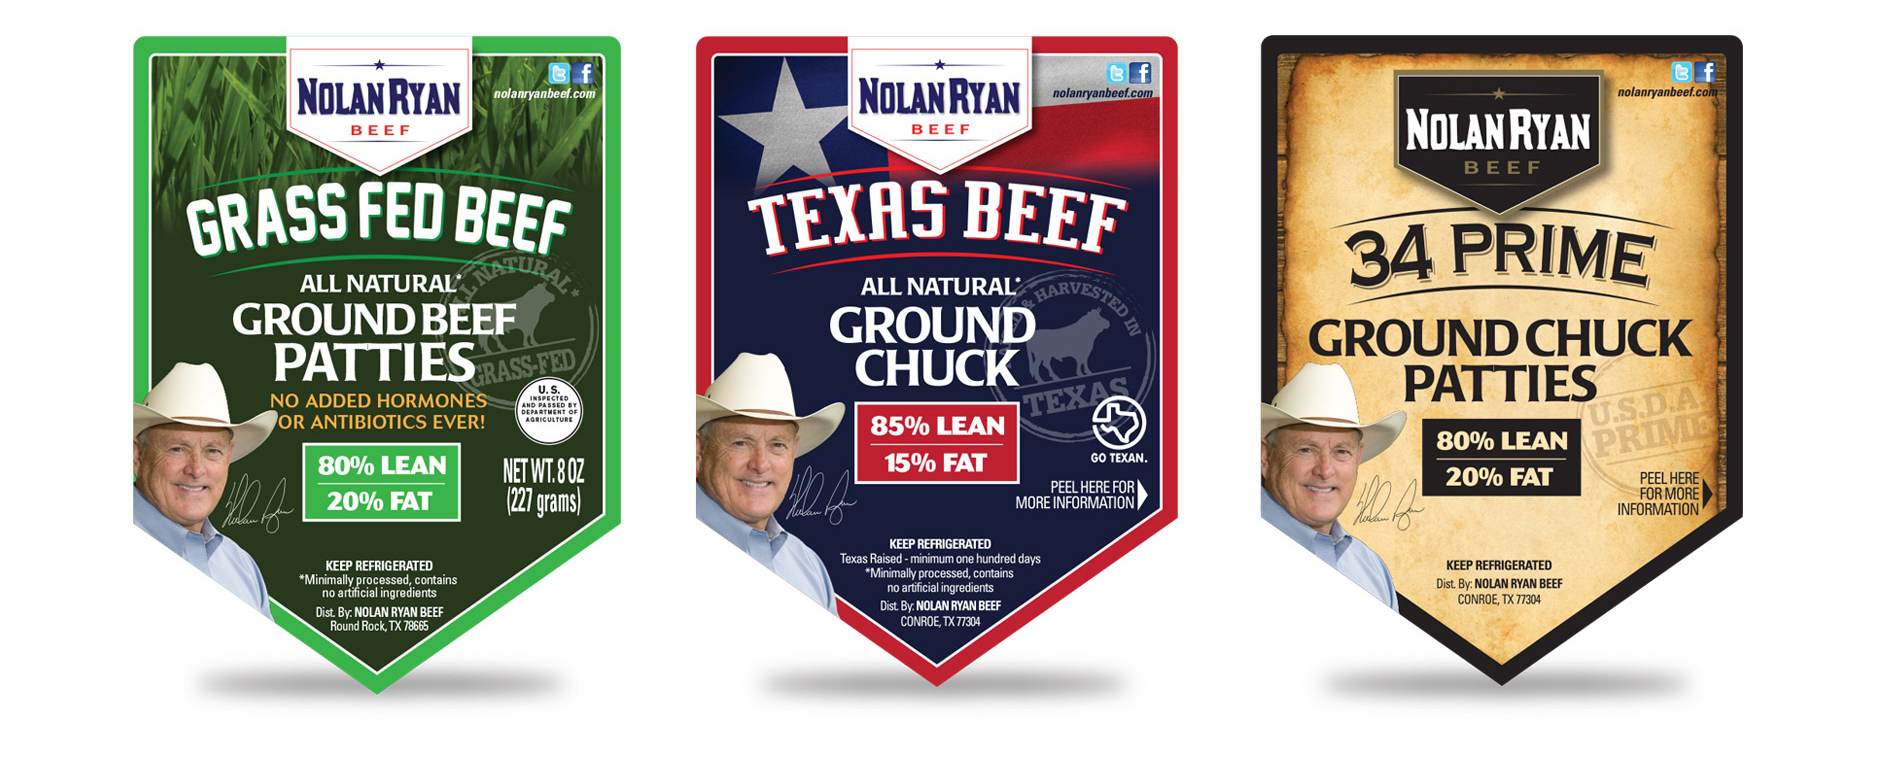 Nolan Ryan Beef Labels